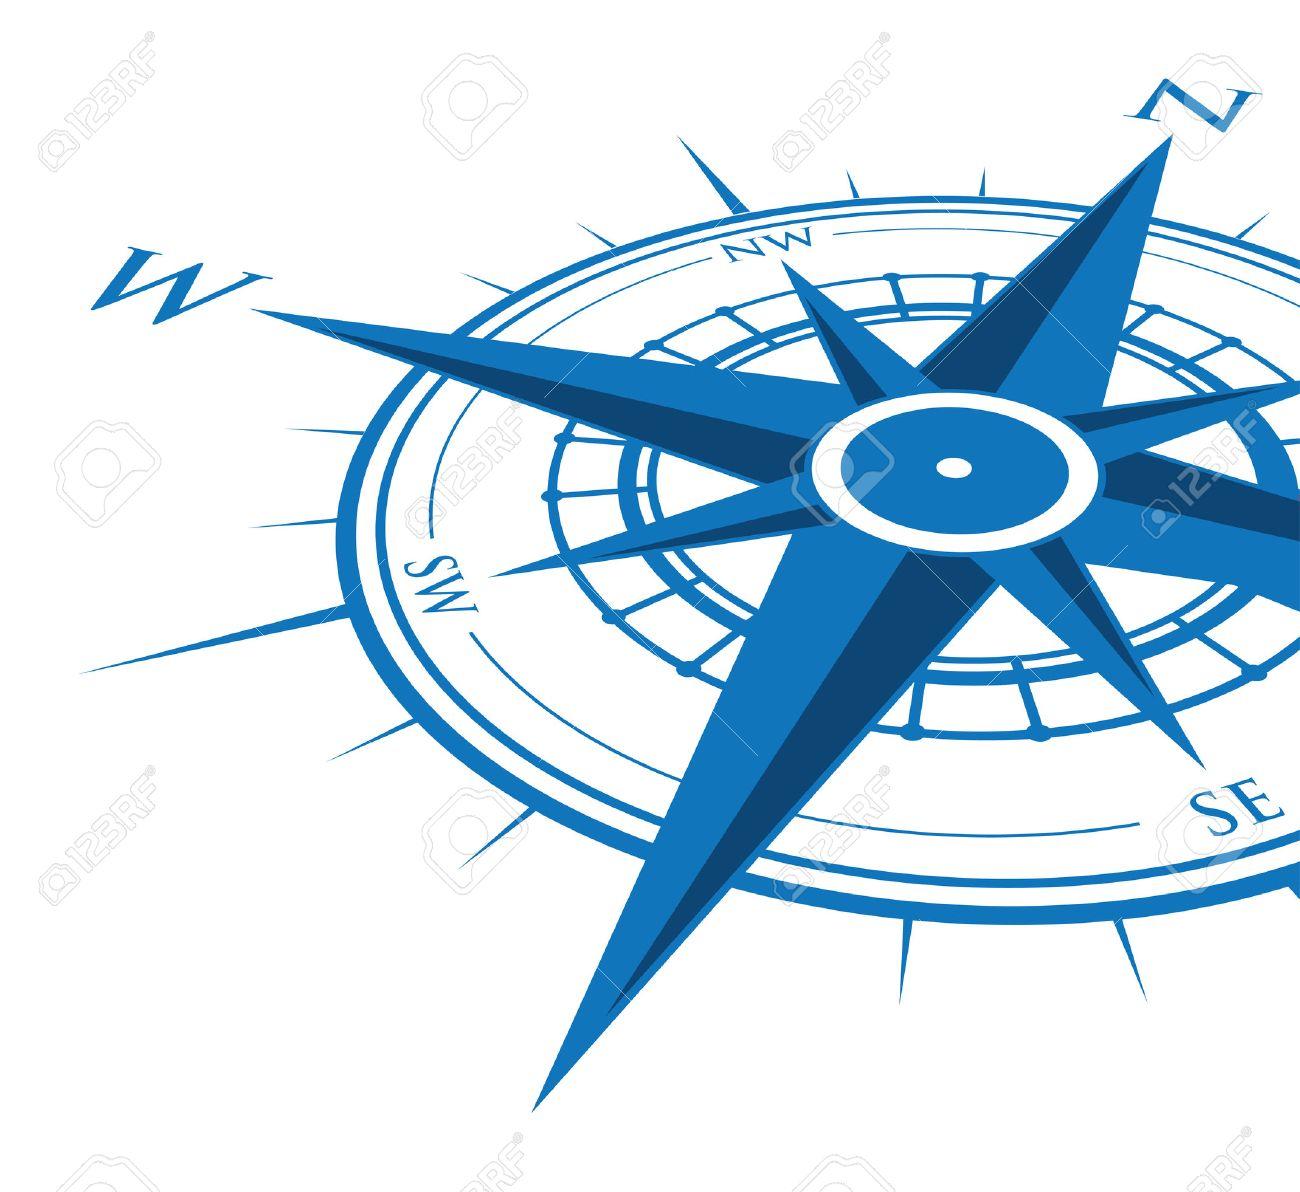 blue compass background - 36274866